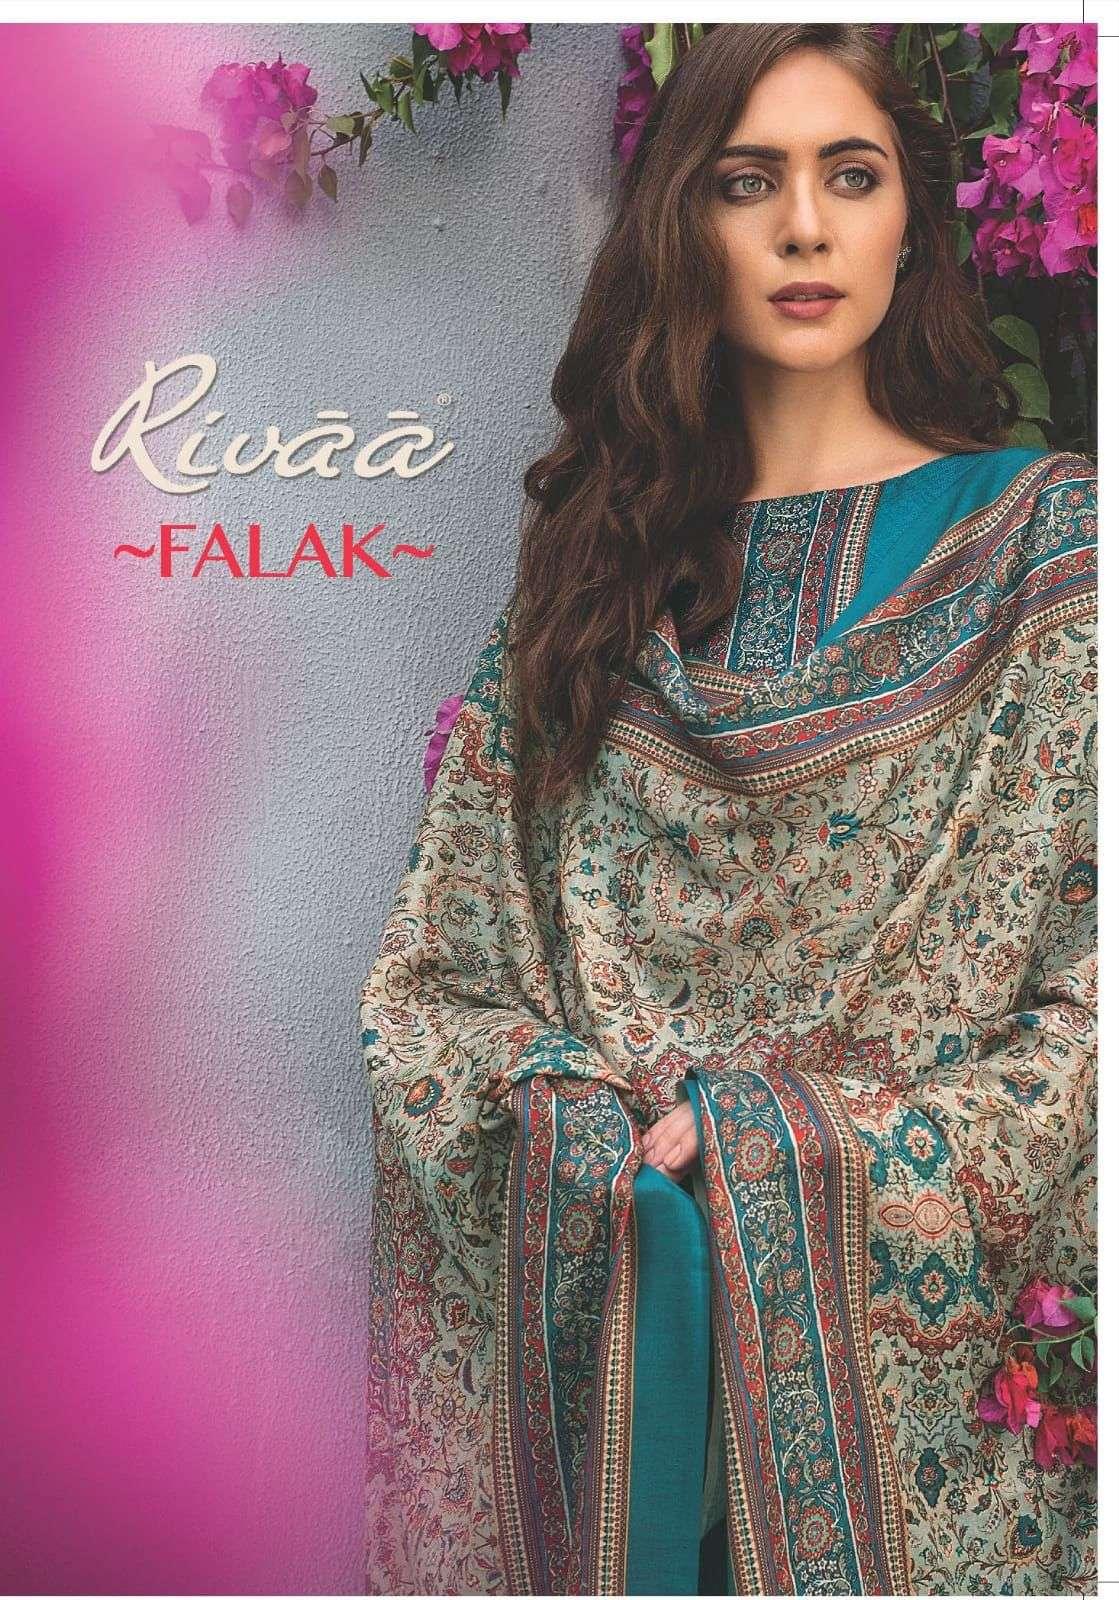 Rivaa Falak Exclusive Fancy pashmina Salwar Kameez Catalog Dealer in Surat